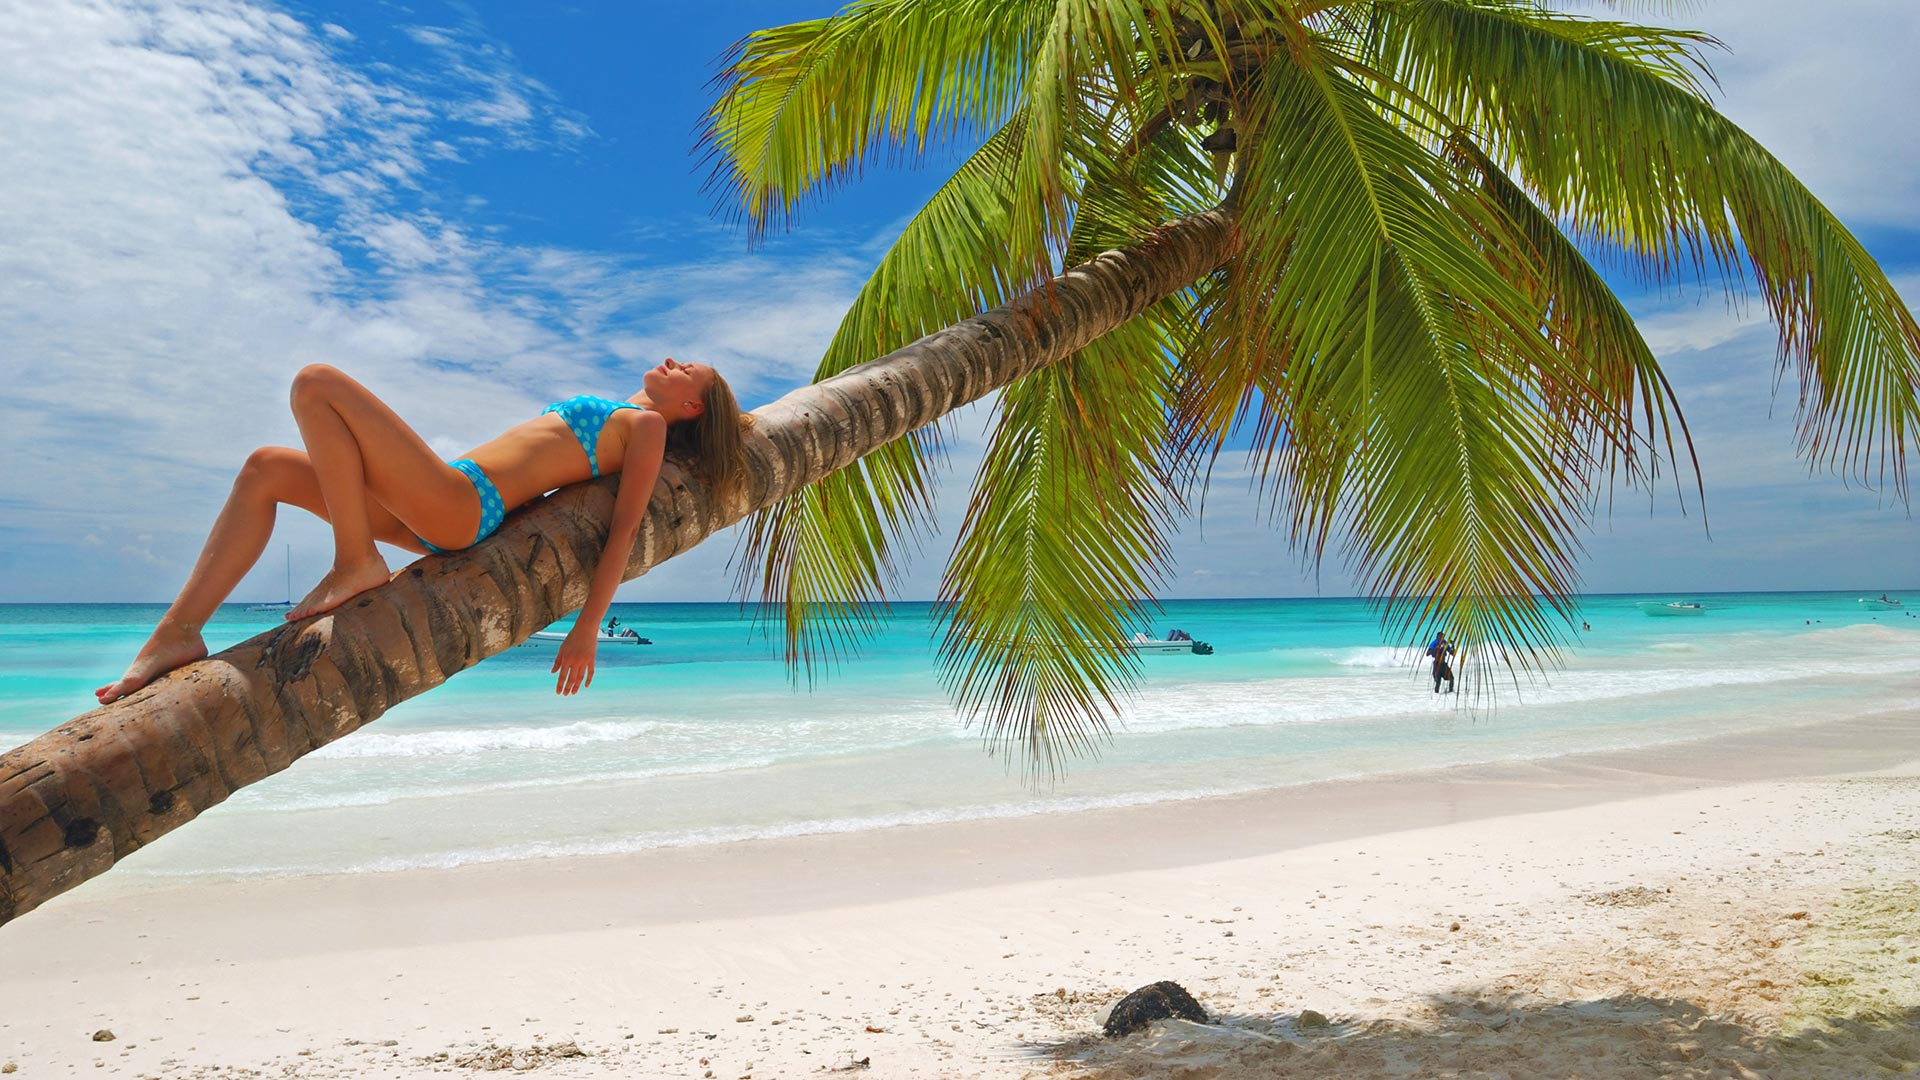 Sejur plaja Punta Cana, Republica Dominicana, 13 zile - 24 noiembrie 2021